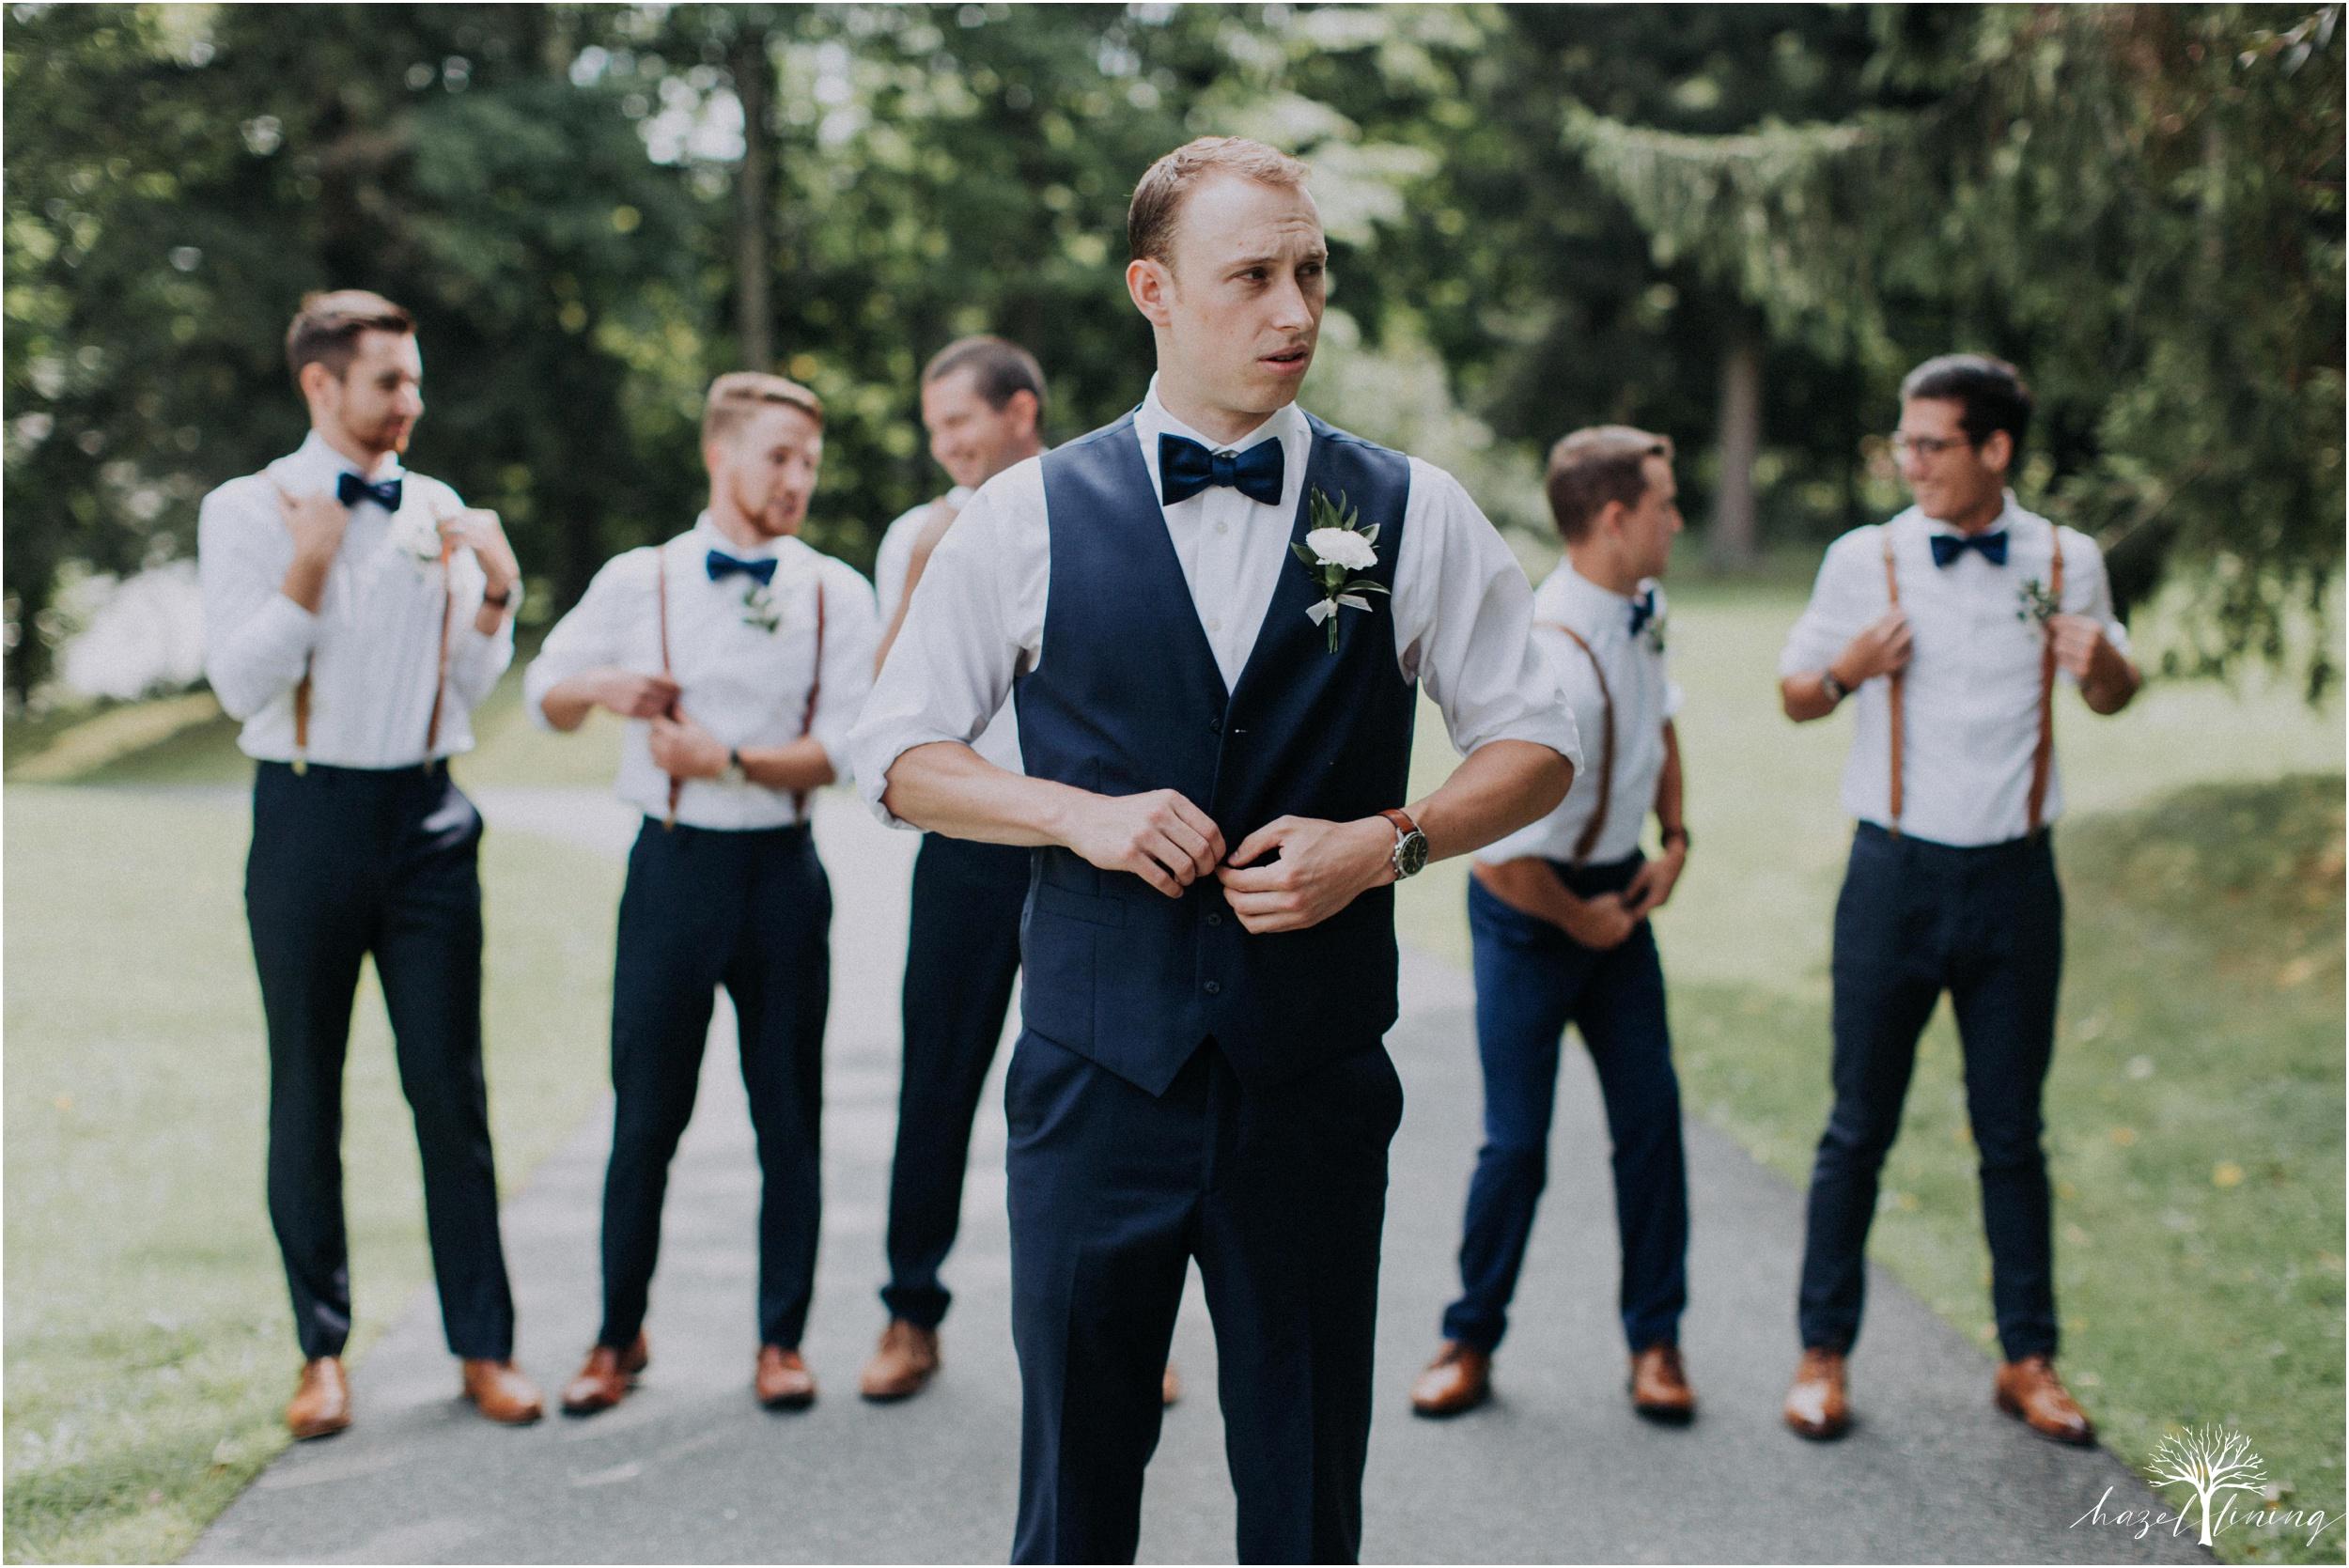 mariah-kreyling-samuel-sherratt-sherrattwiththeworld-peirce-farm-at-witch-hill-boston-massachusetts-wedding-photography-hazel-lining-travel-wedding-elopement-photography_0058.jpg